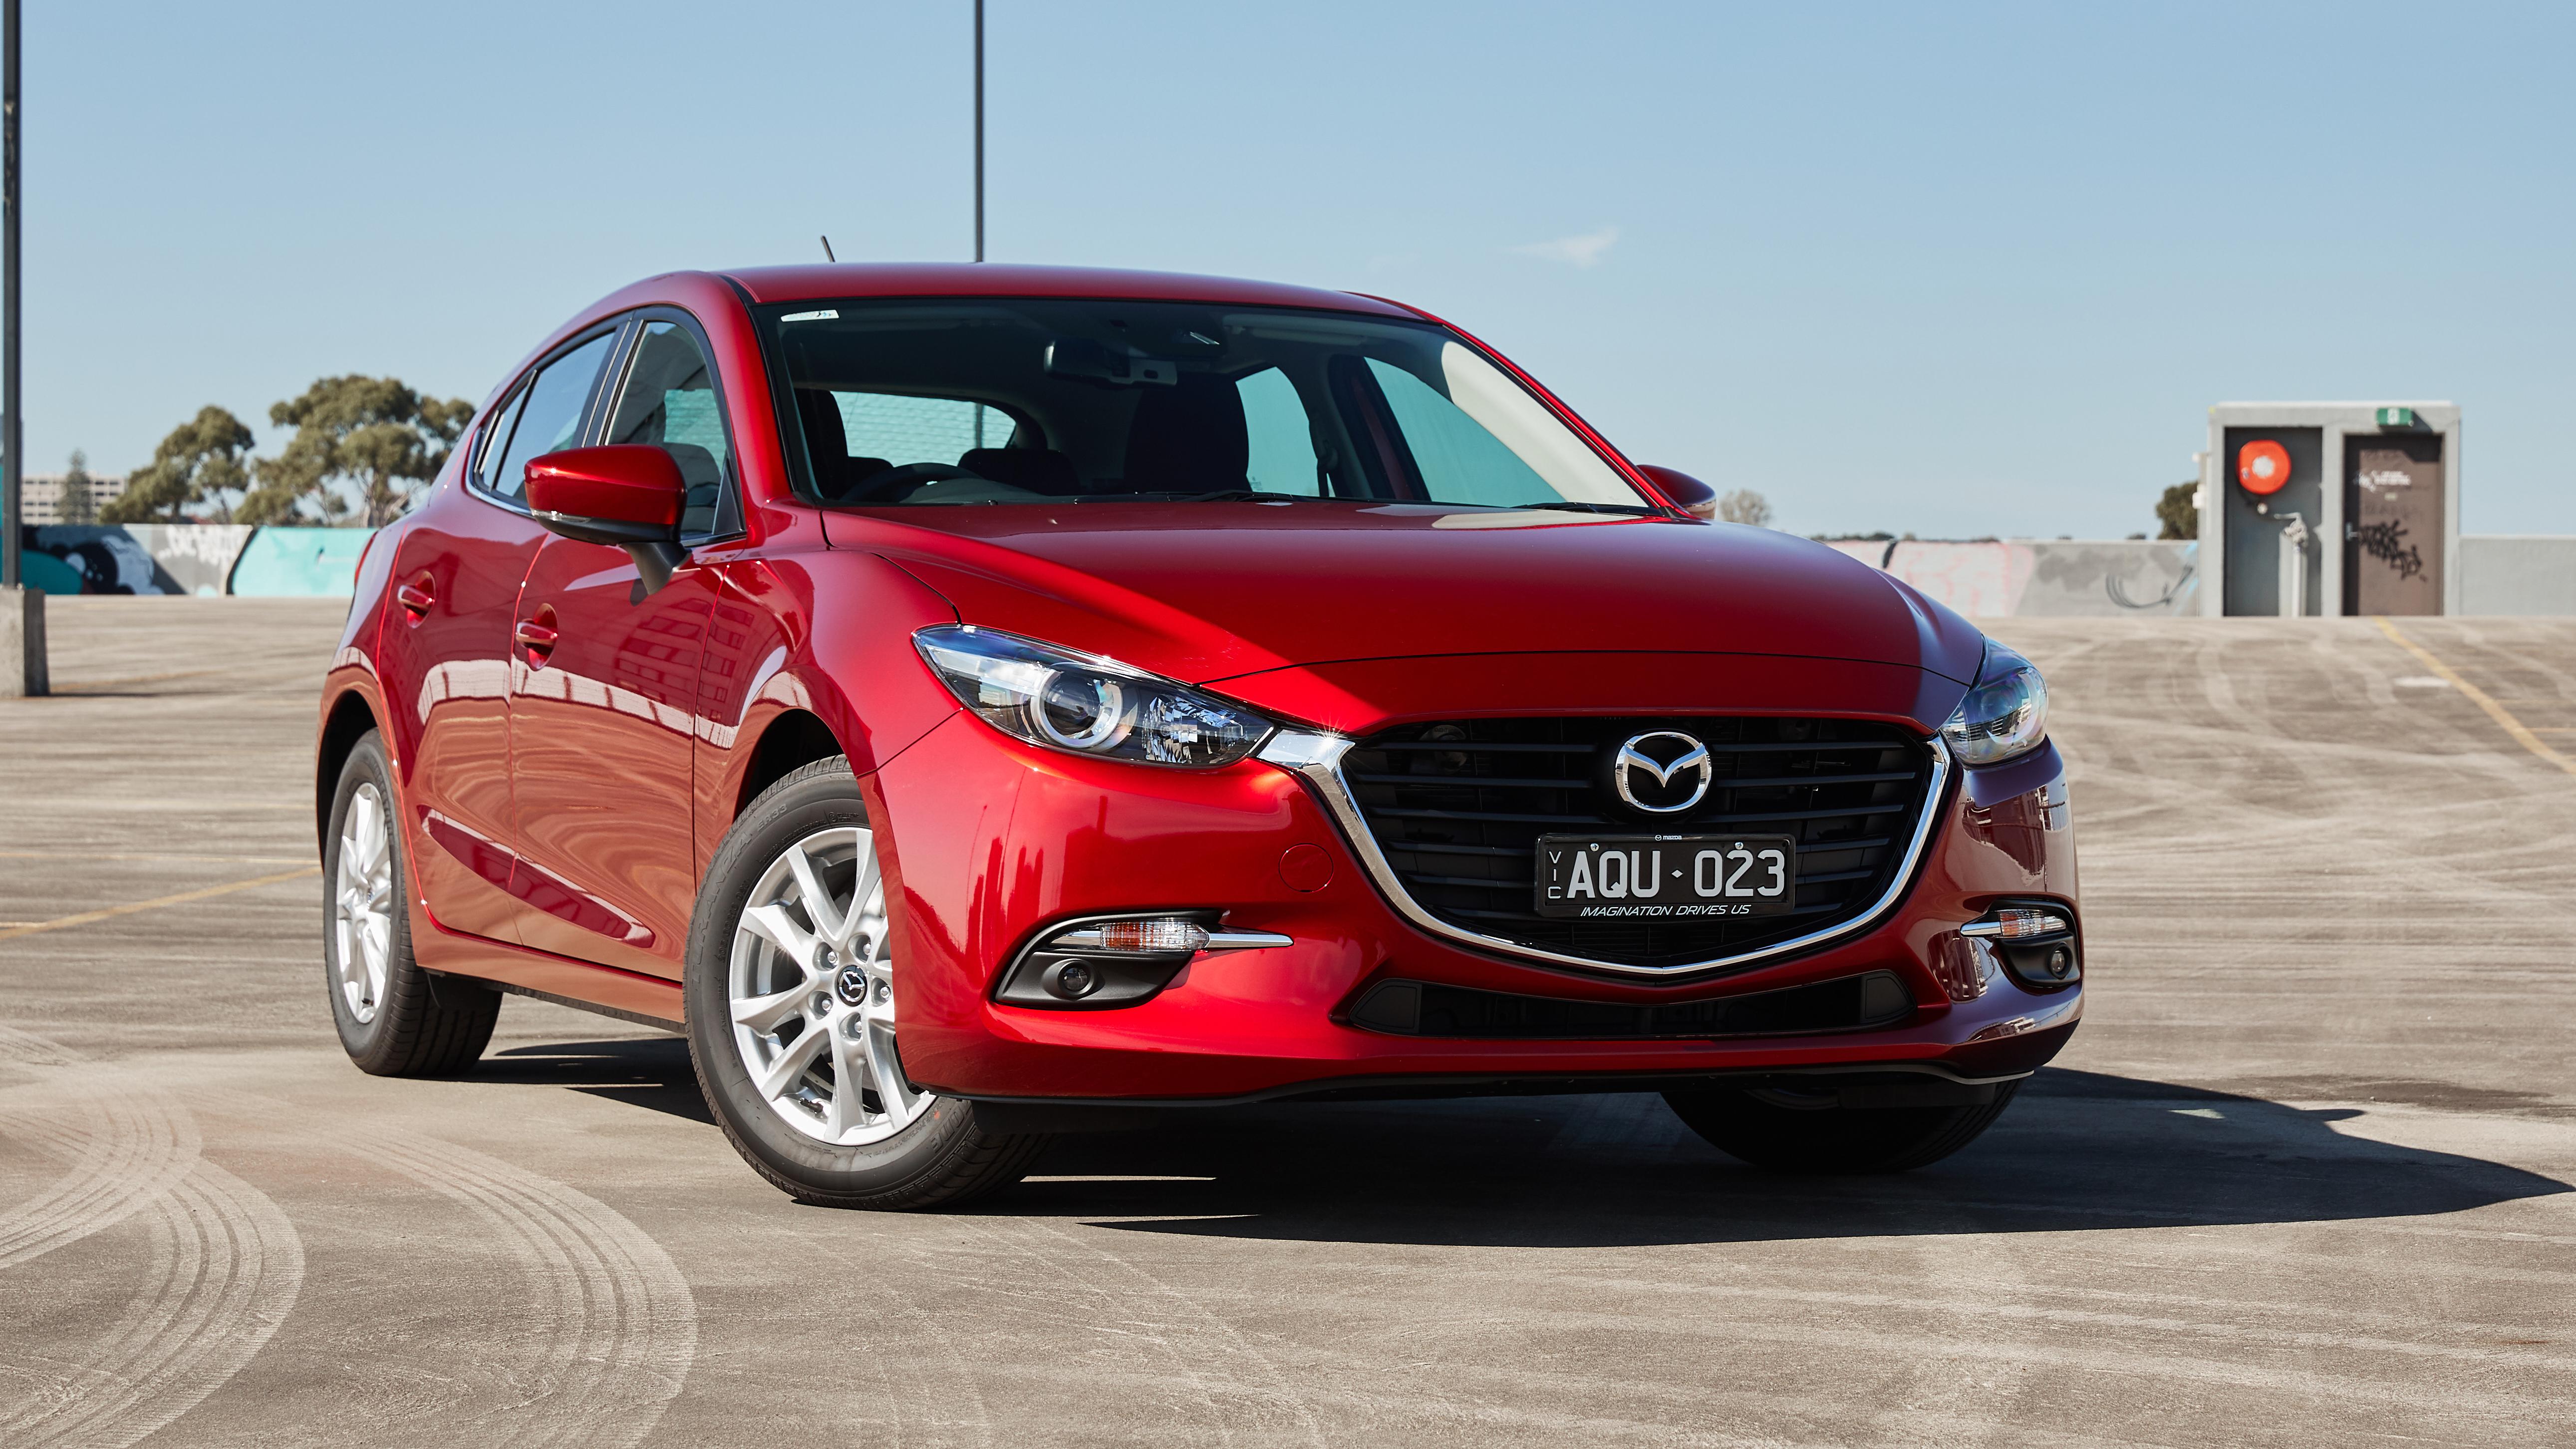 2018 Mazda 3 Maxx Sport hatch review | CarAdvice